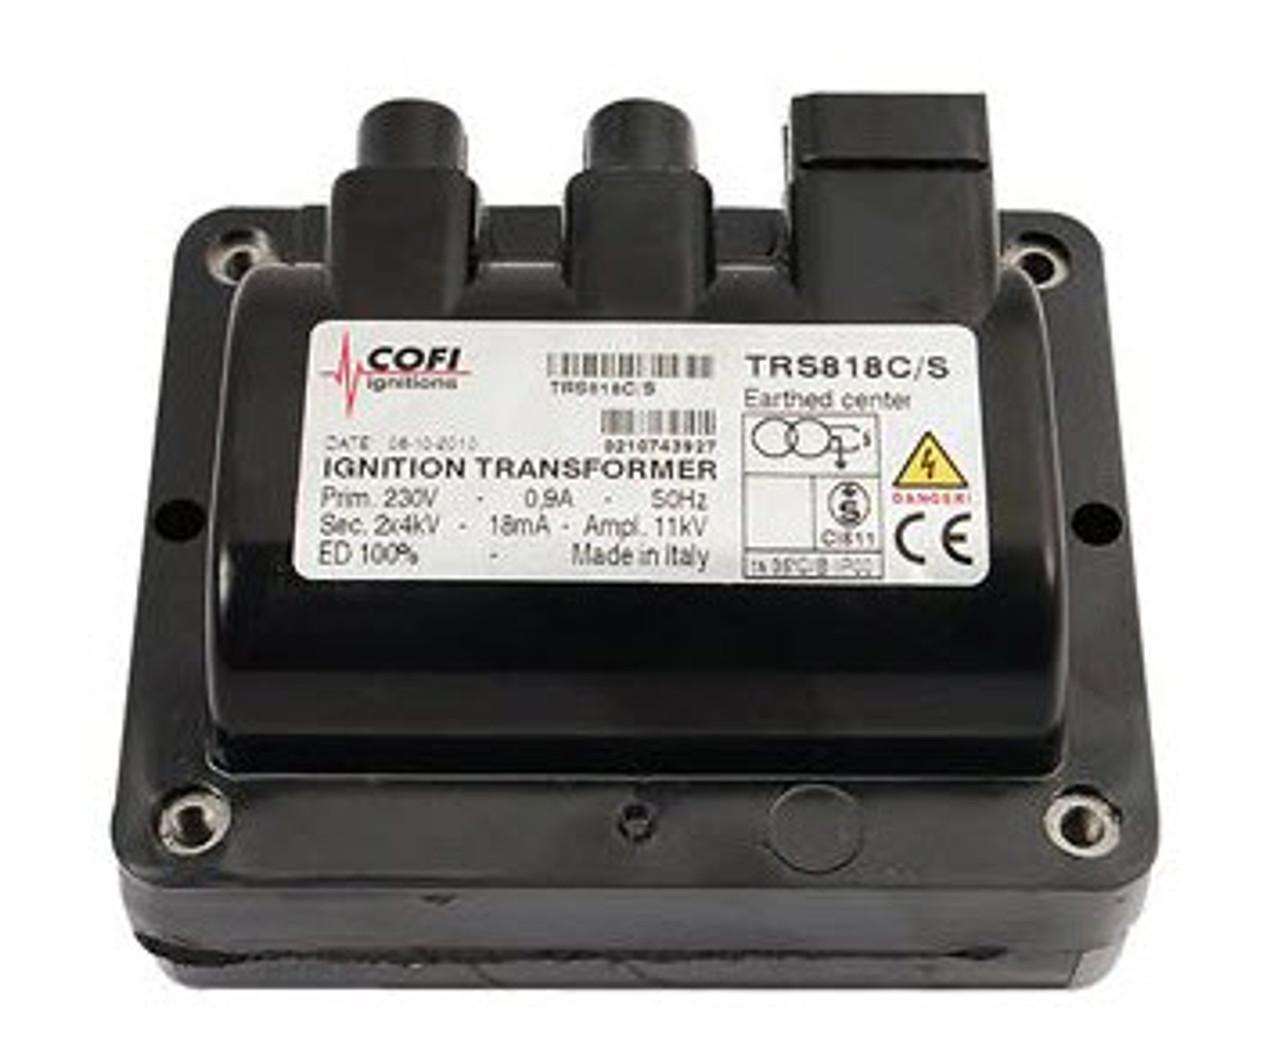 COFI TRS818C/S ignition transformer